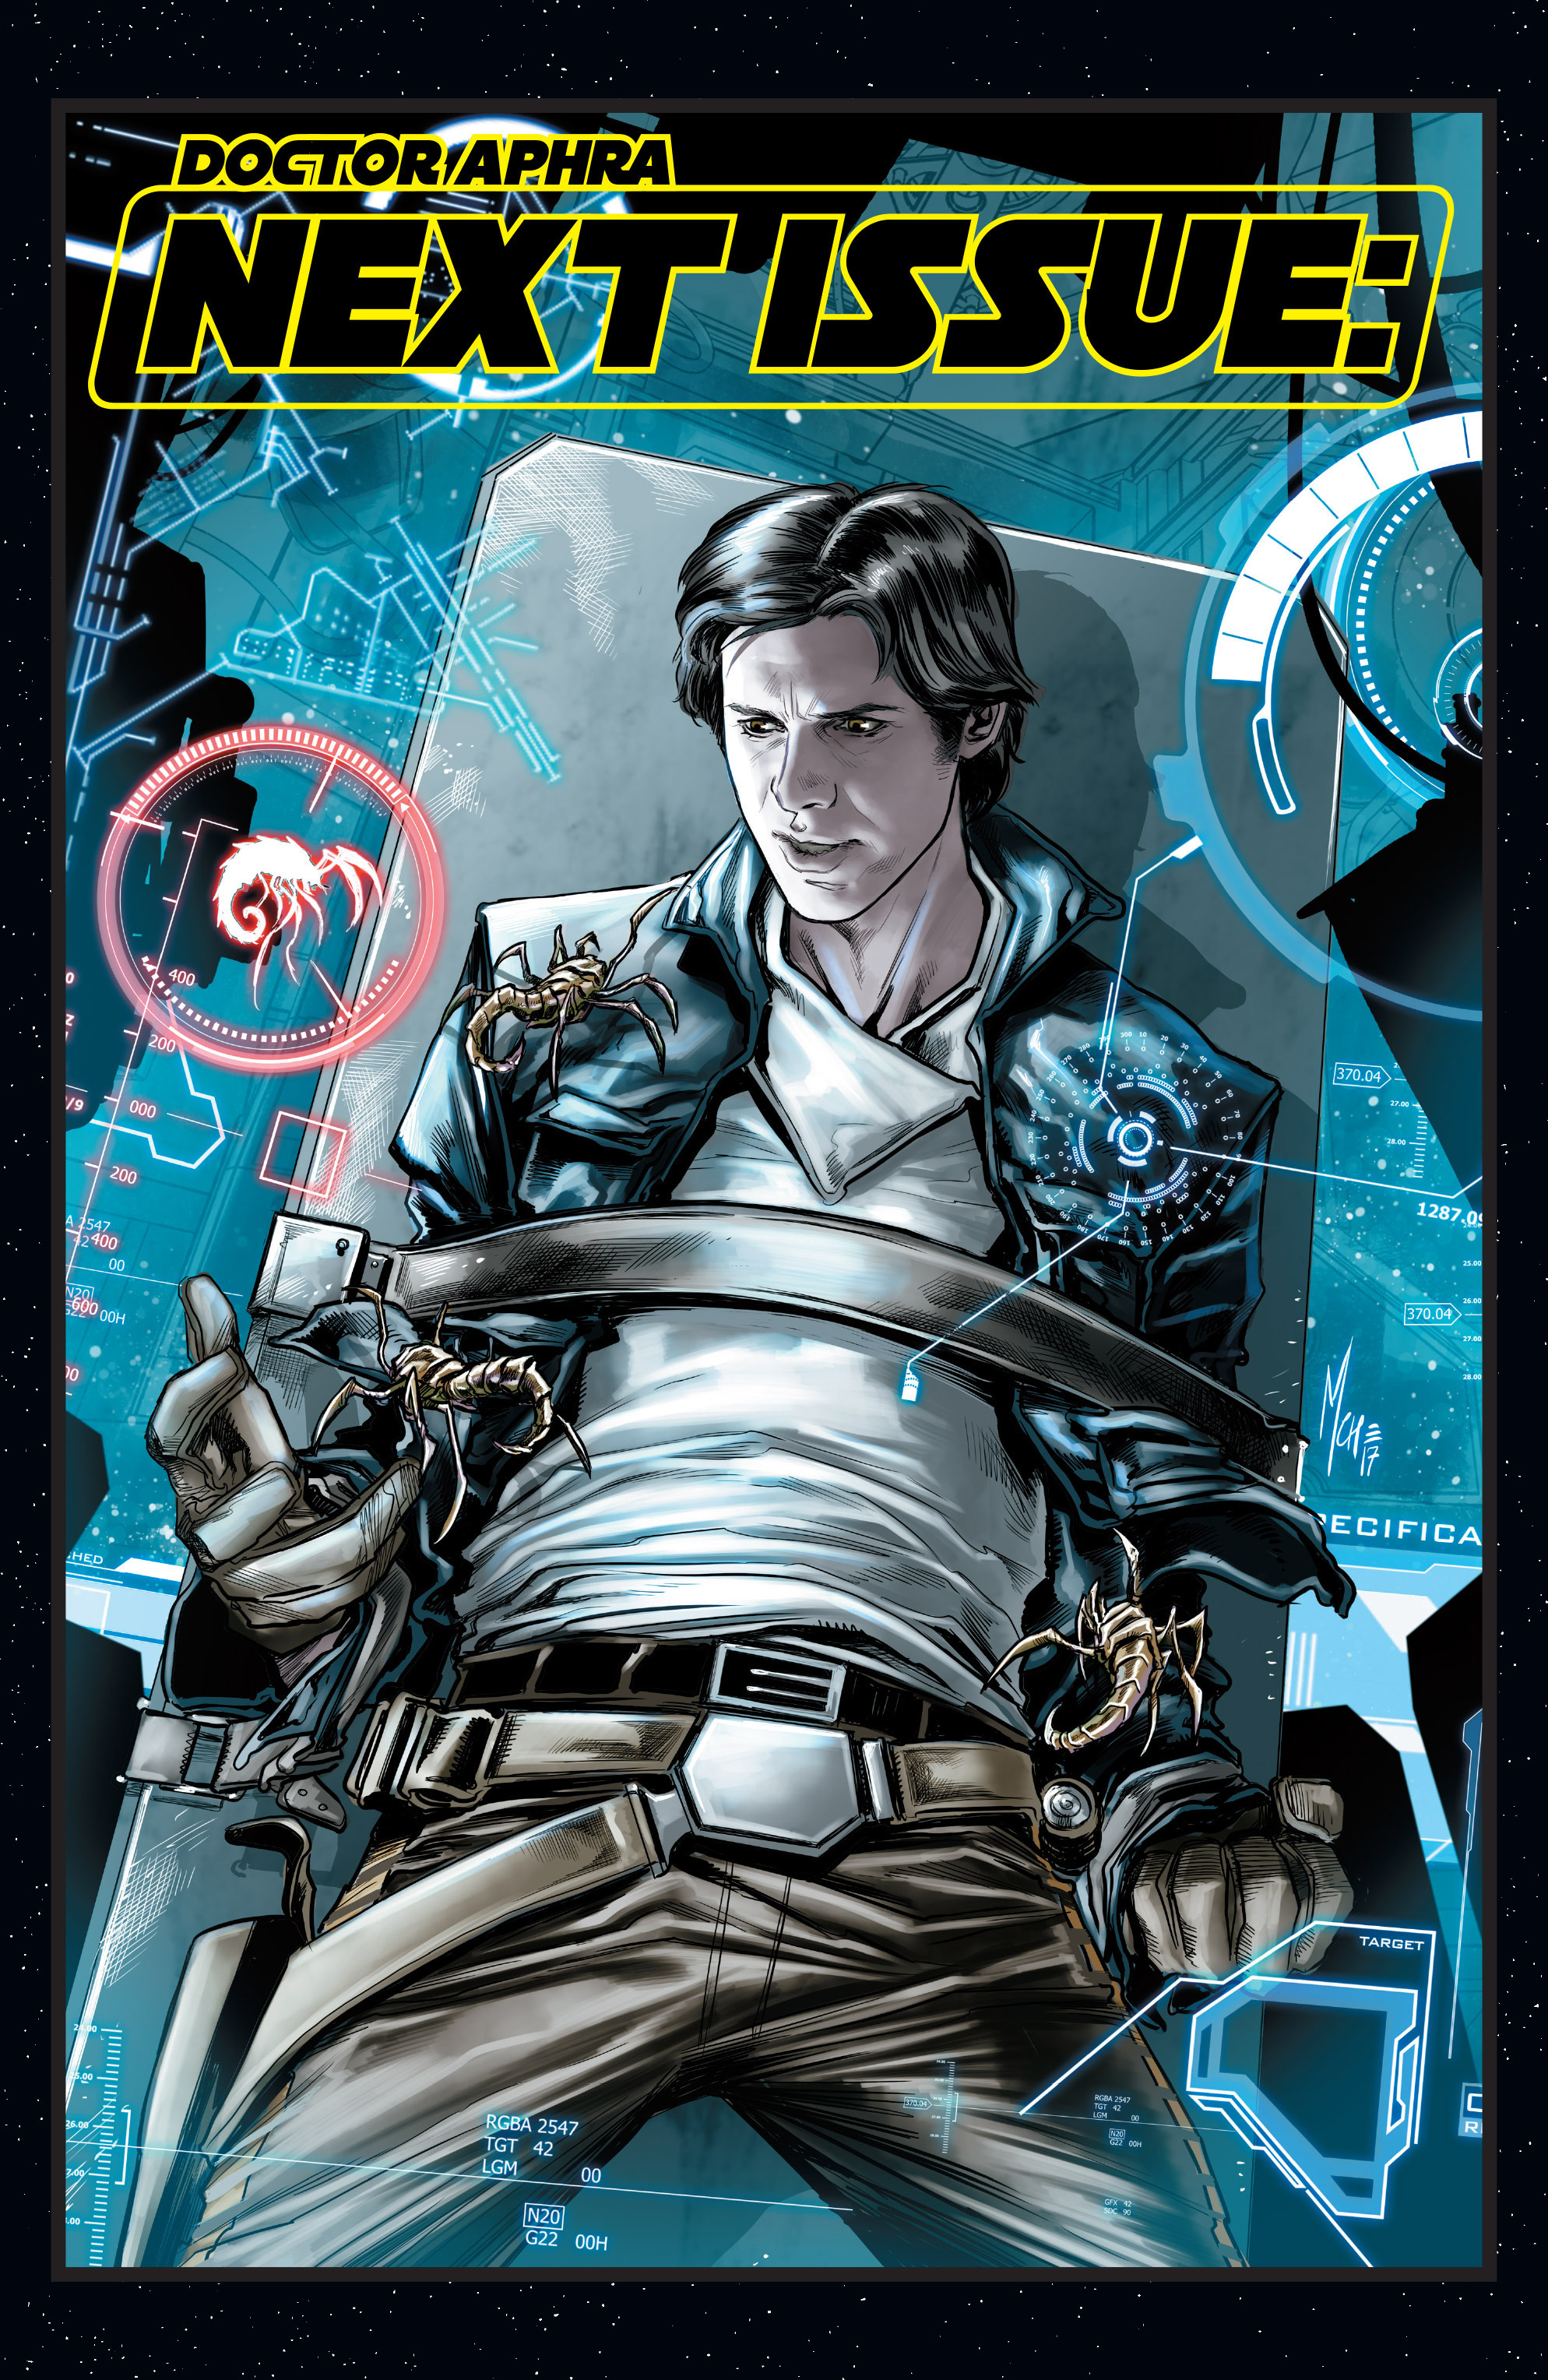 Star Wars 031-022